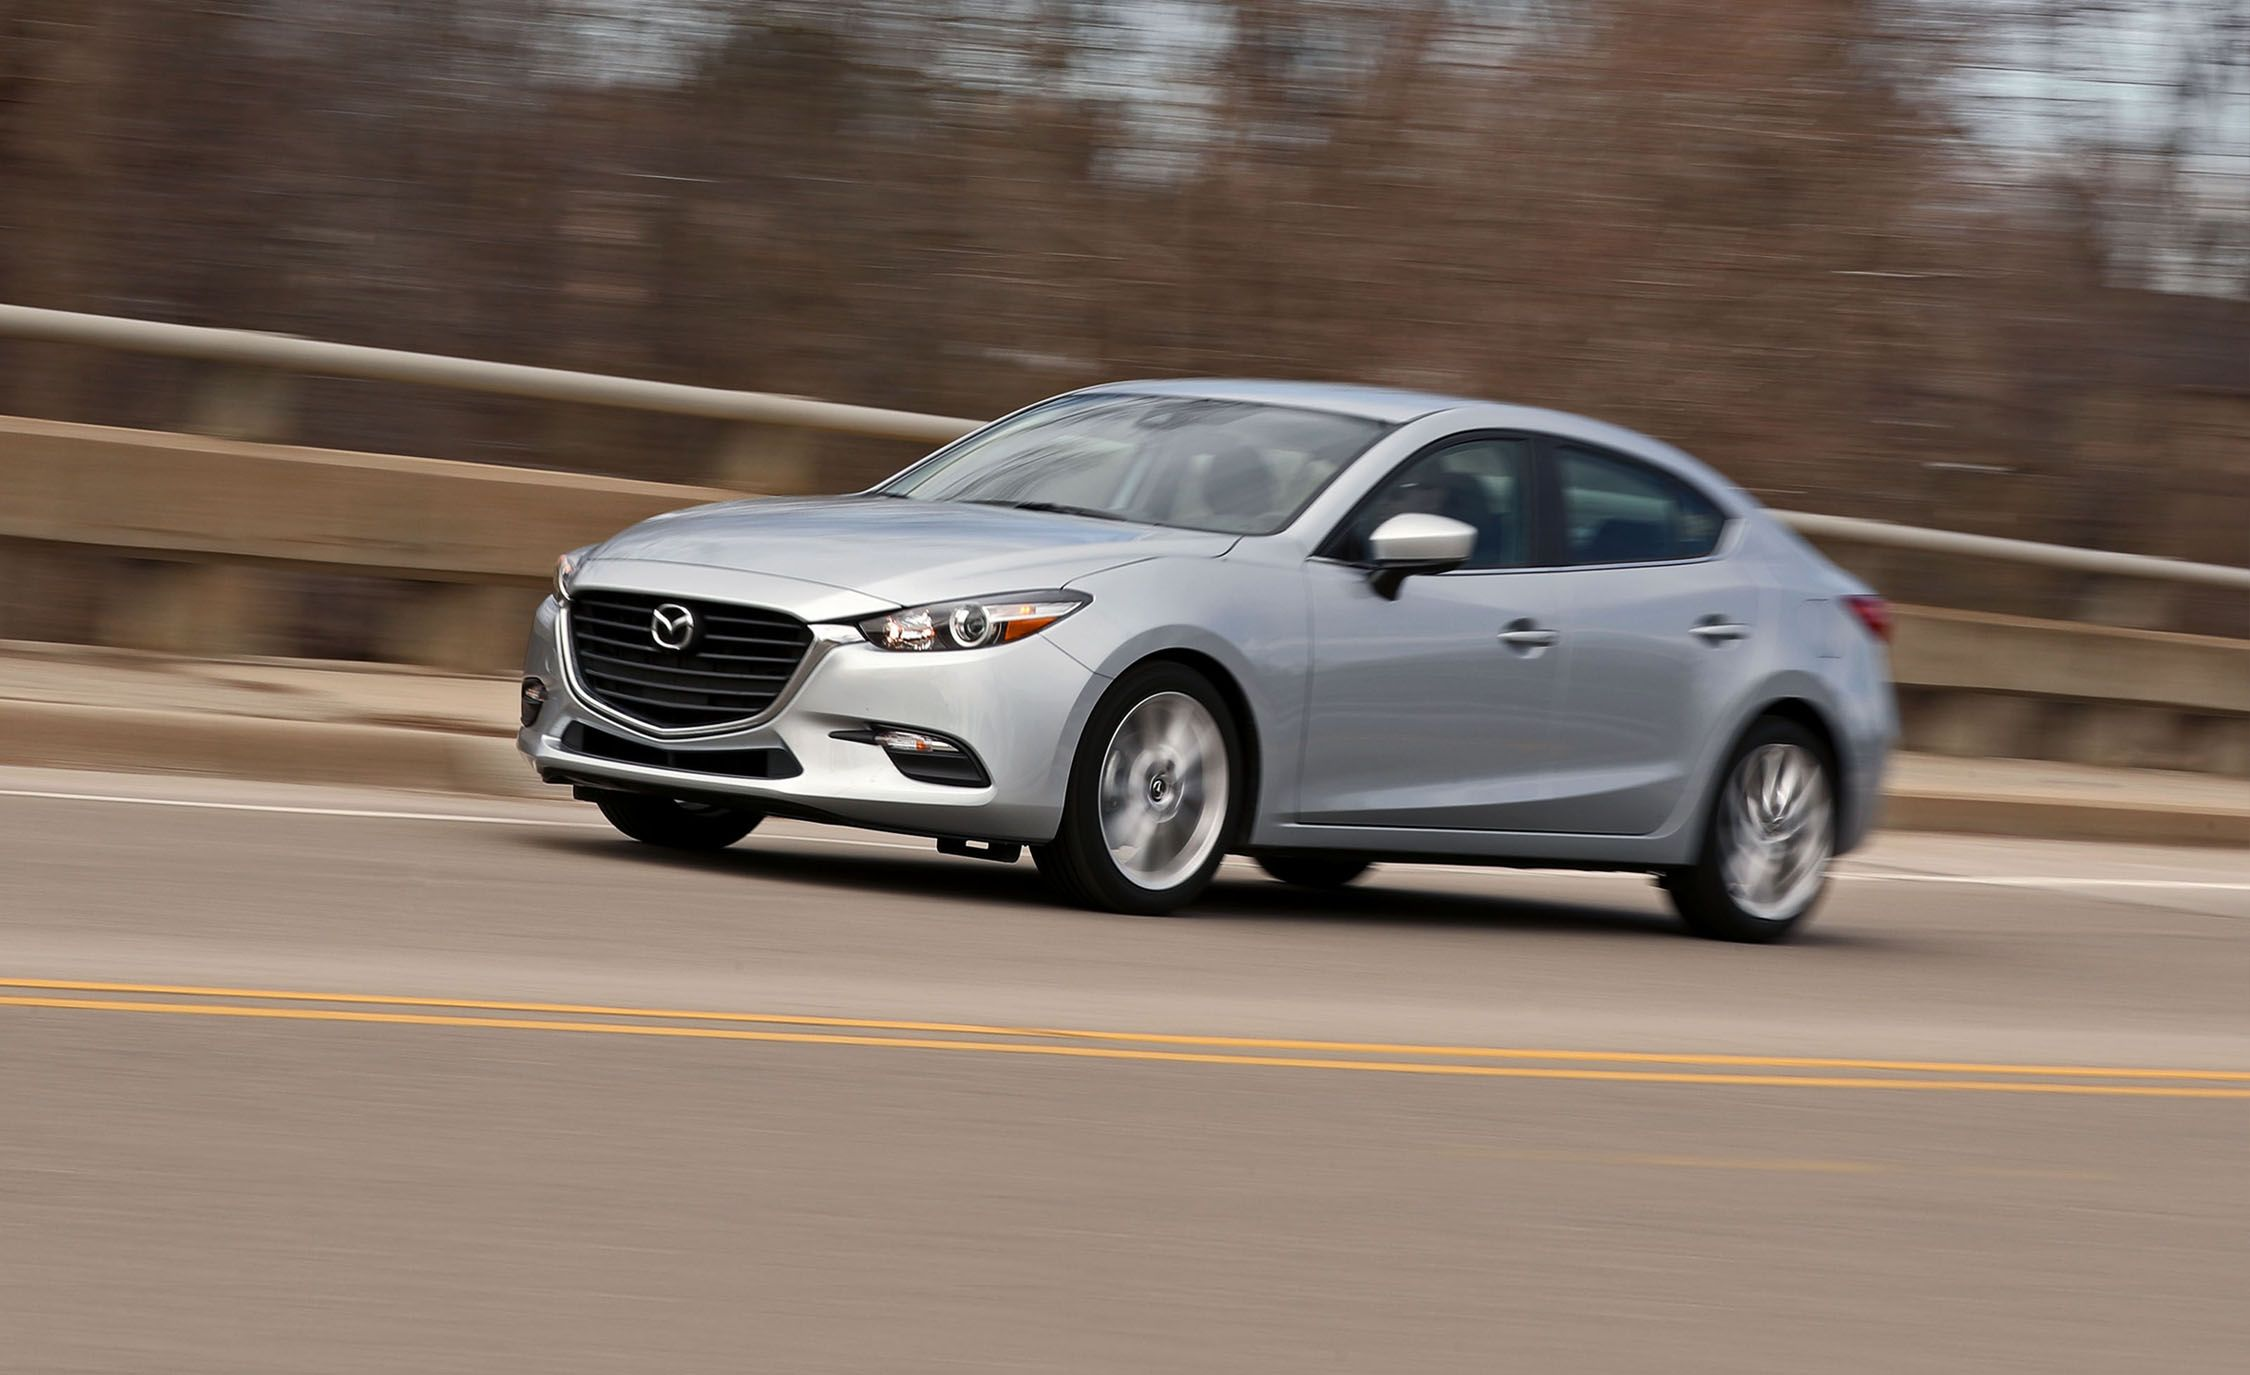 Charming 2017 Mazda 3 2.0L Automatic Sedan